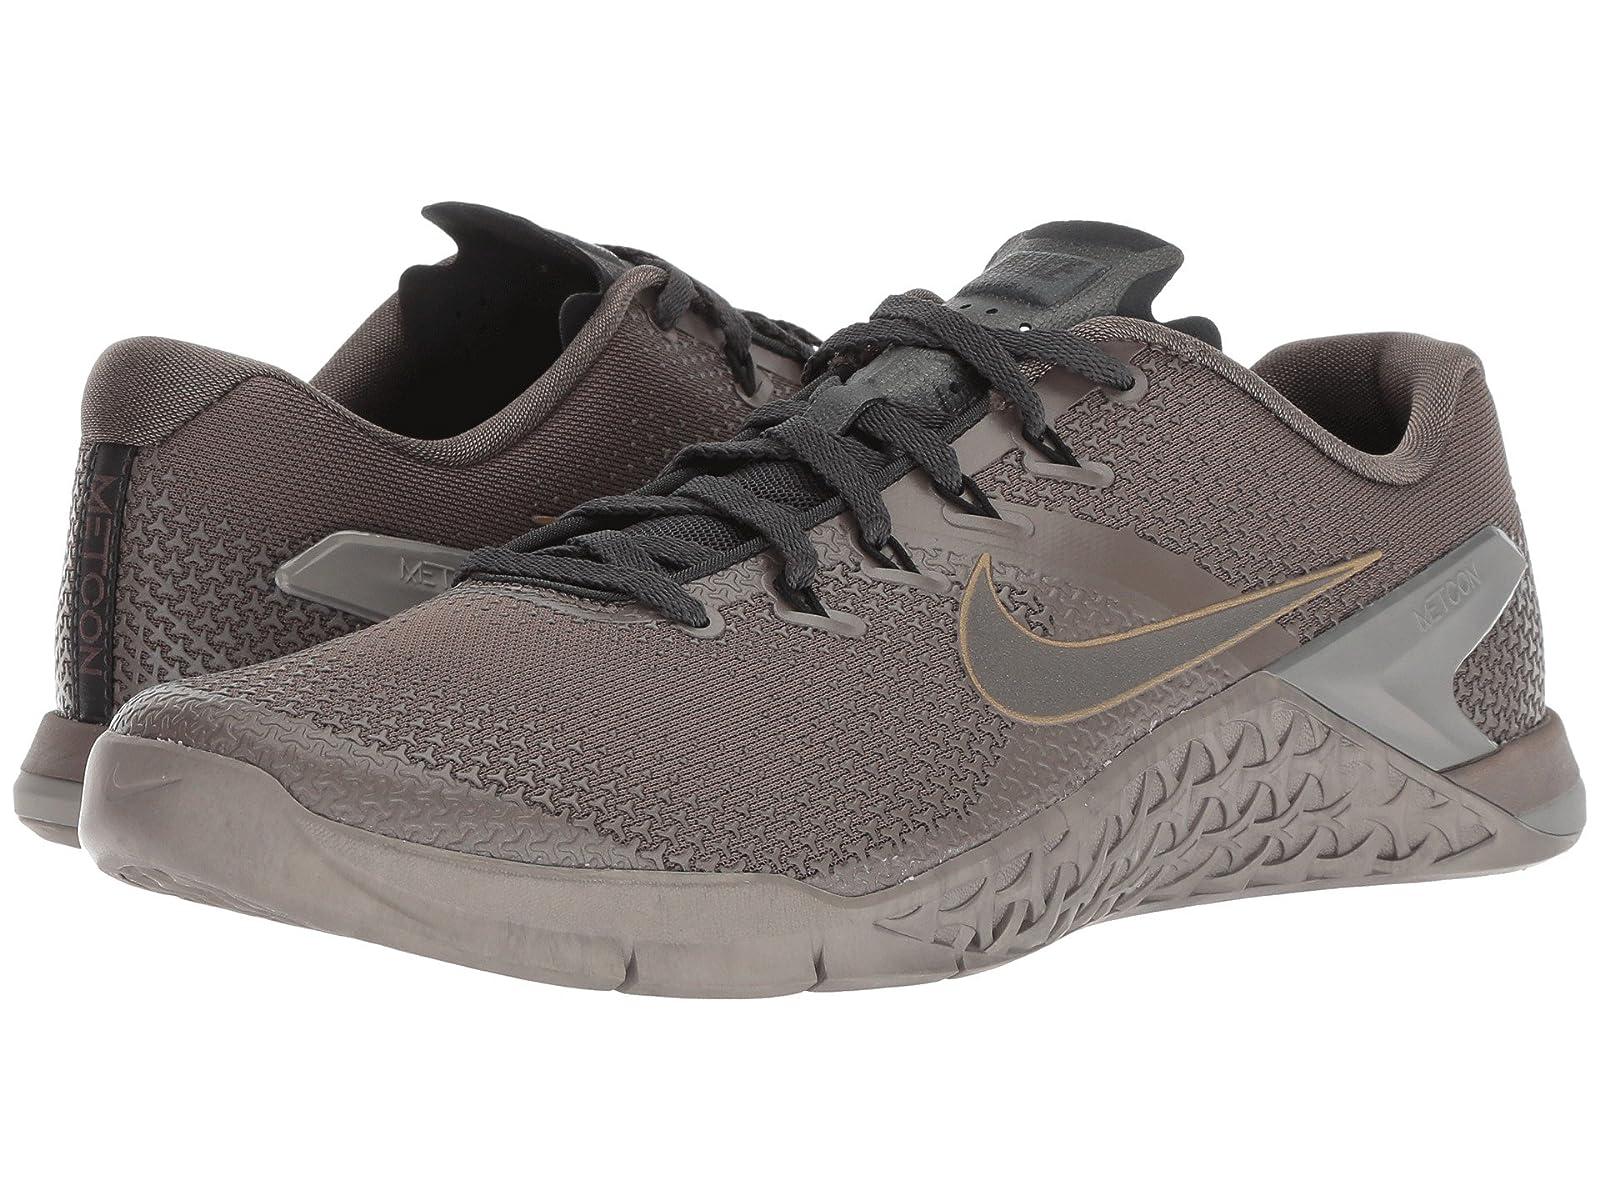 Nike Metcon 4 Viking QuestCheap and distinctive eye-catching shoes